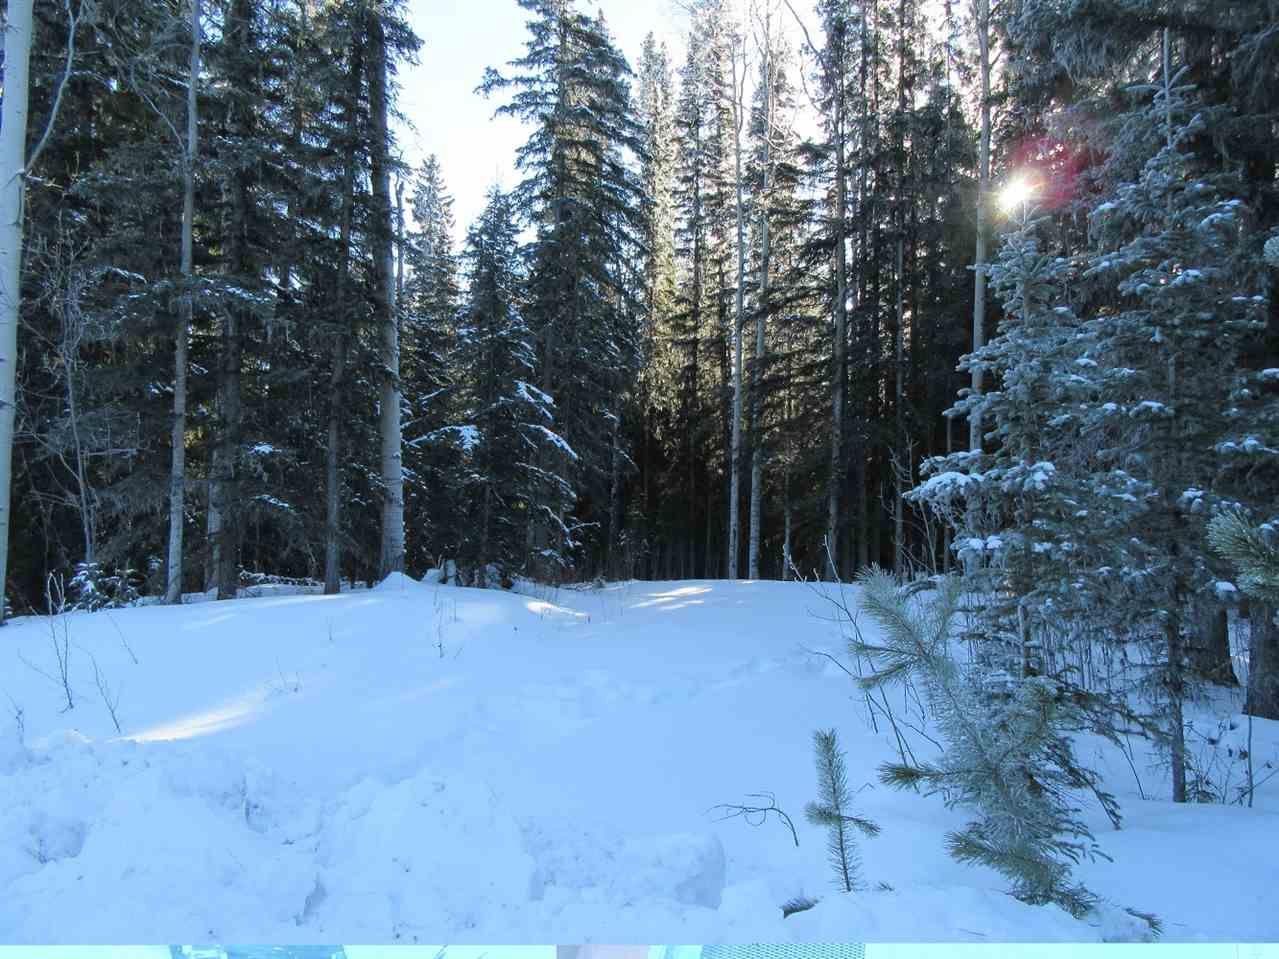 Main Photo: 7592 LUDLOM ROAD: Deka Lake / Sulphurous / Hathaway Lakes Land for sale (100 Mile House (Zone 10))  : MLS®# R2532799